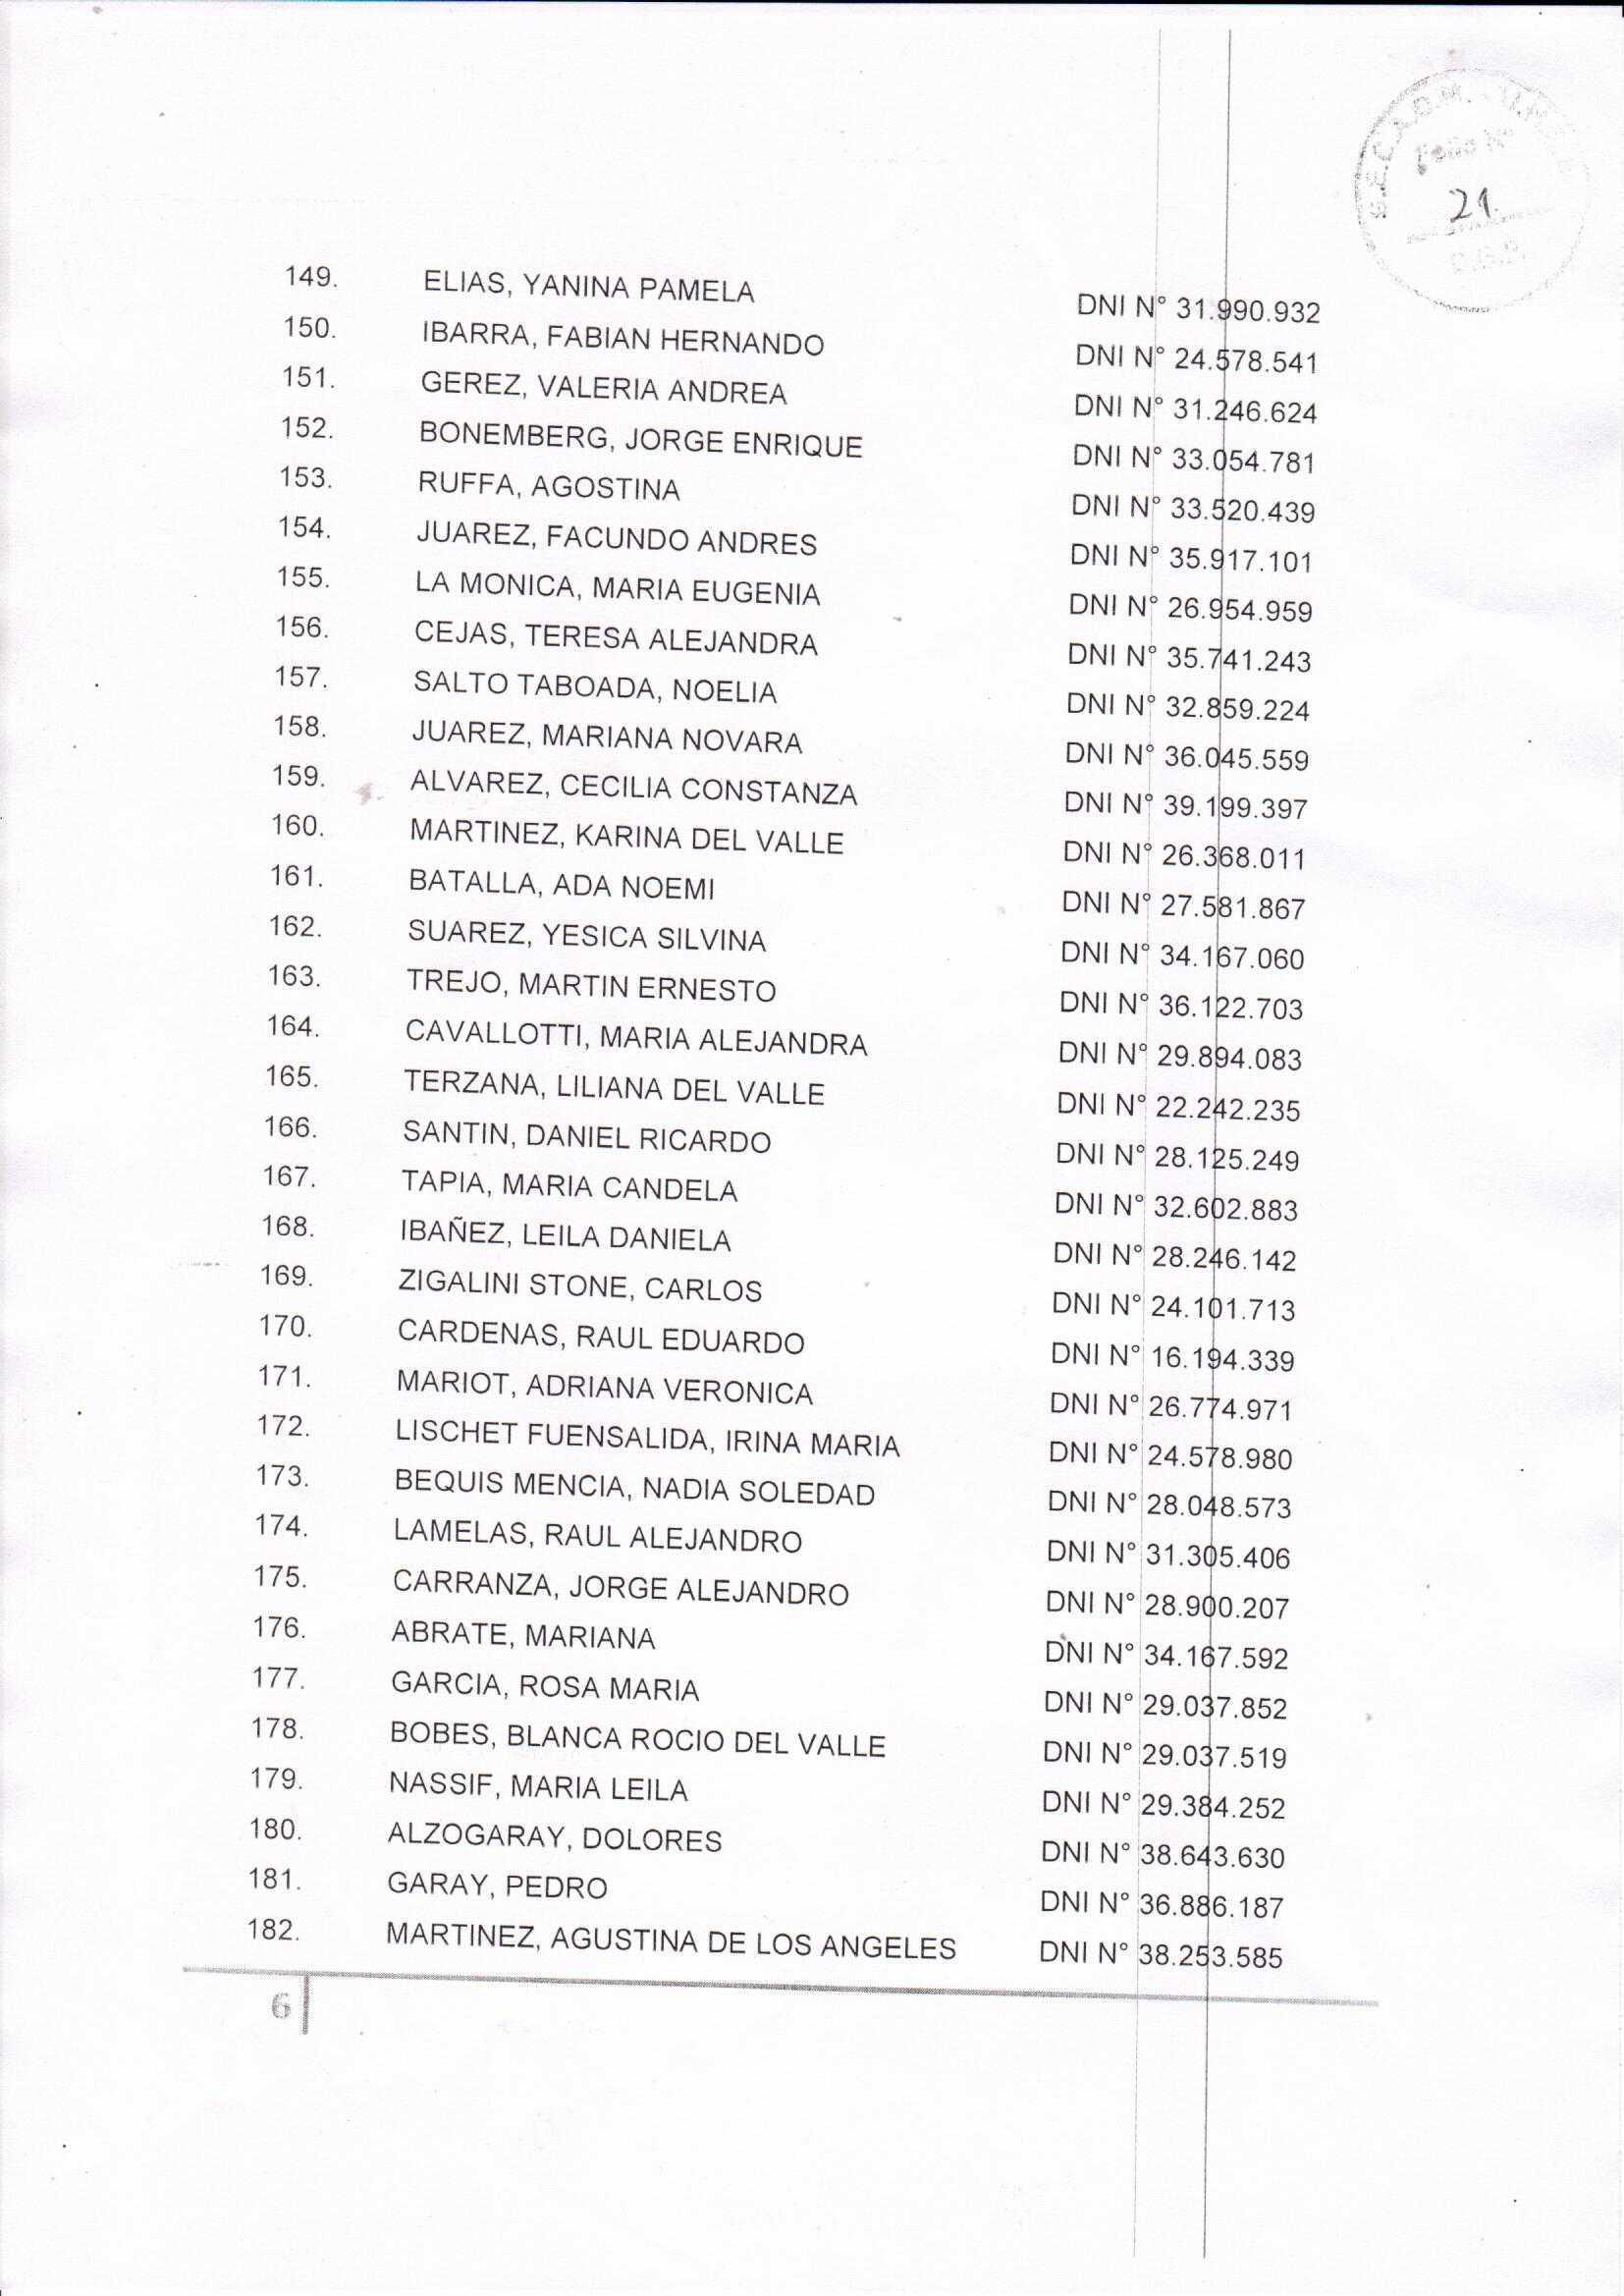 Lista Inscriptos_Página_6